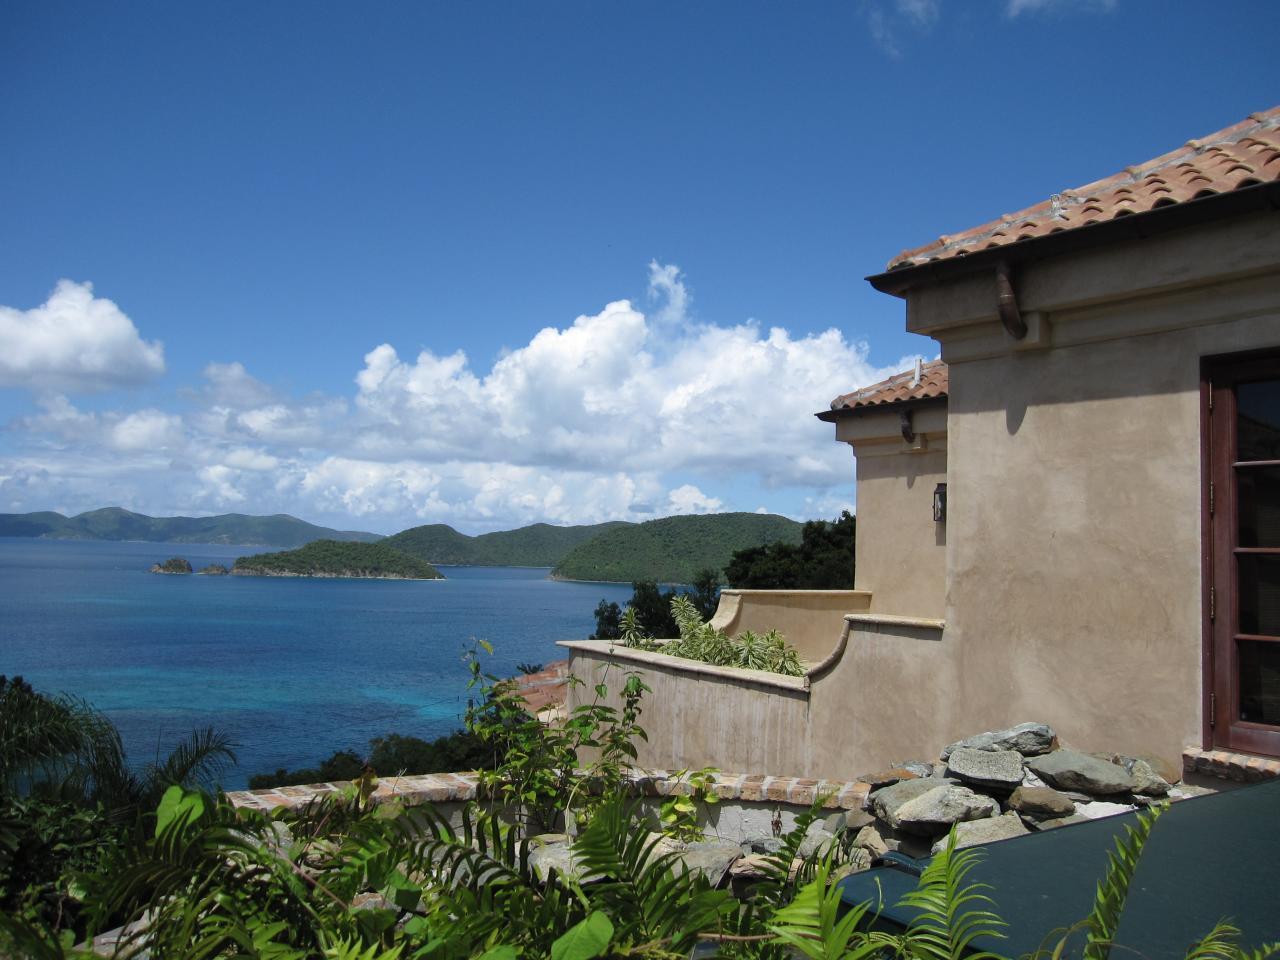 Amorosa's North Shore view